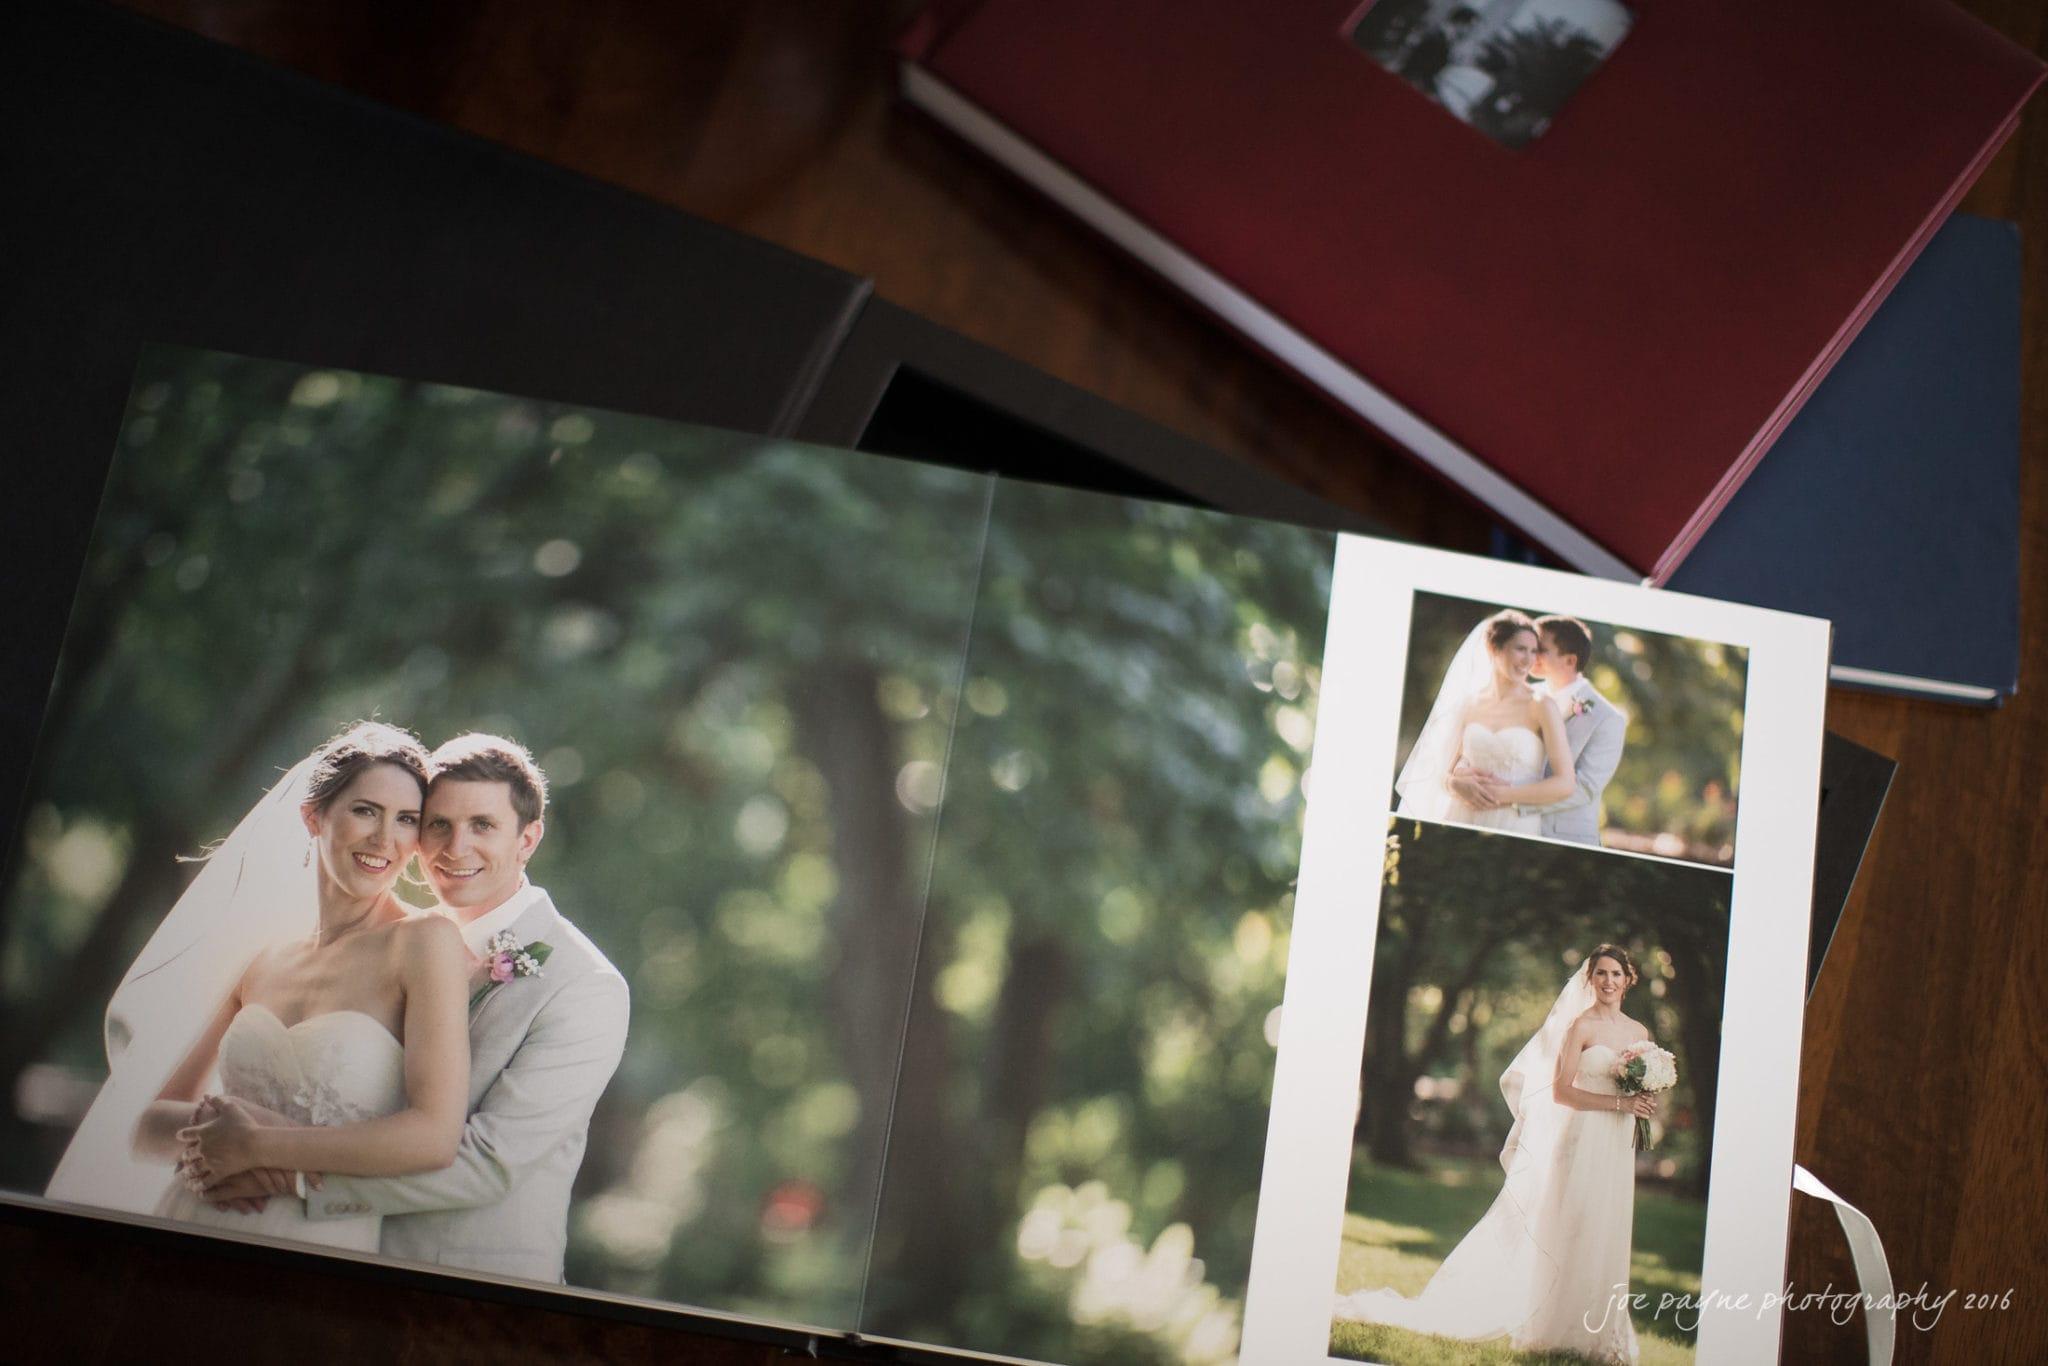 raleigh-wedding-photographer-joe-payne-photography-albums-6